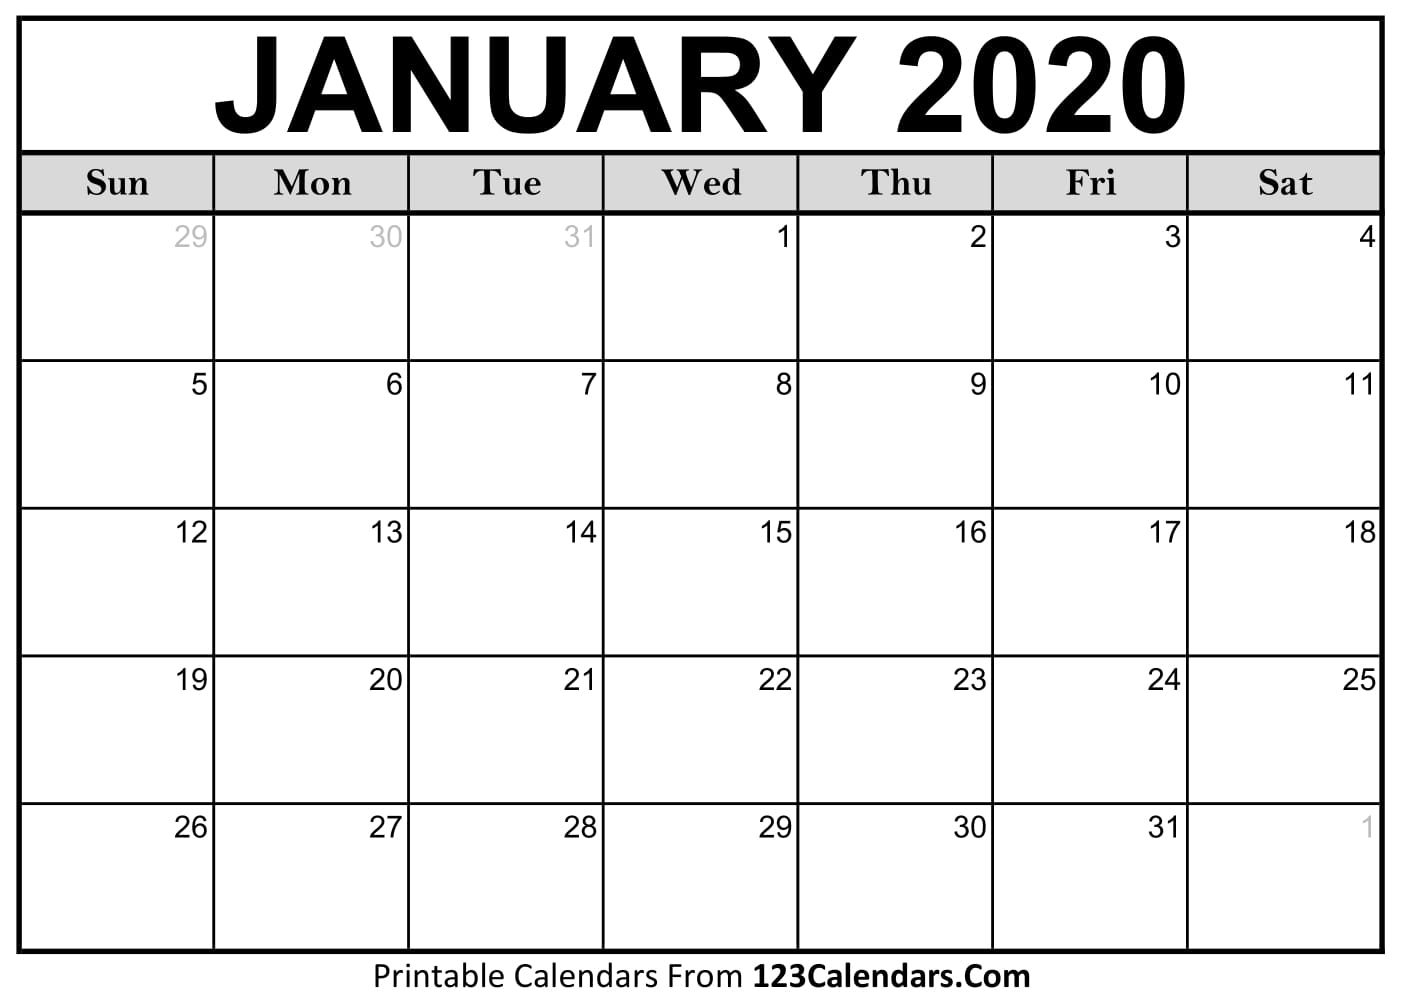 Free Printable Calendar | 123Calendars-Blank 2 Pages